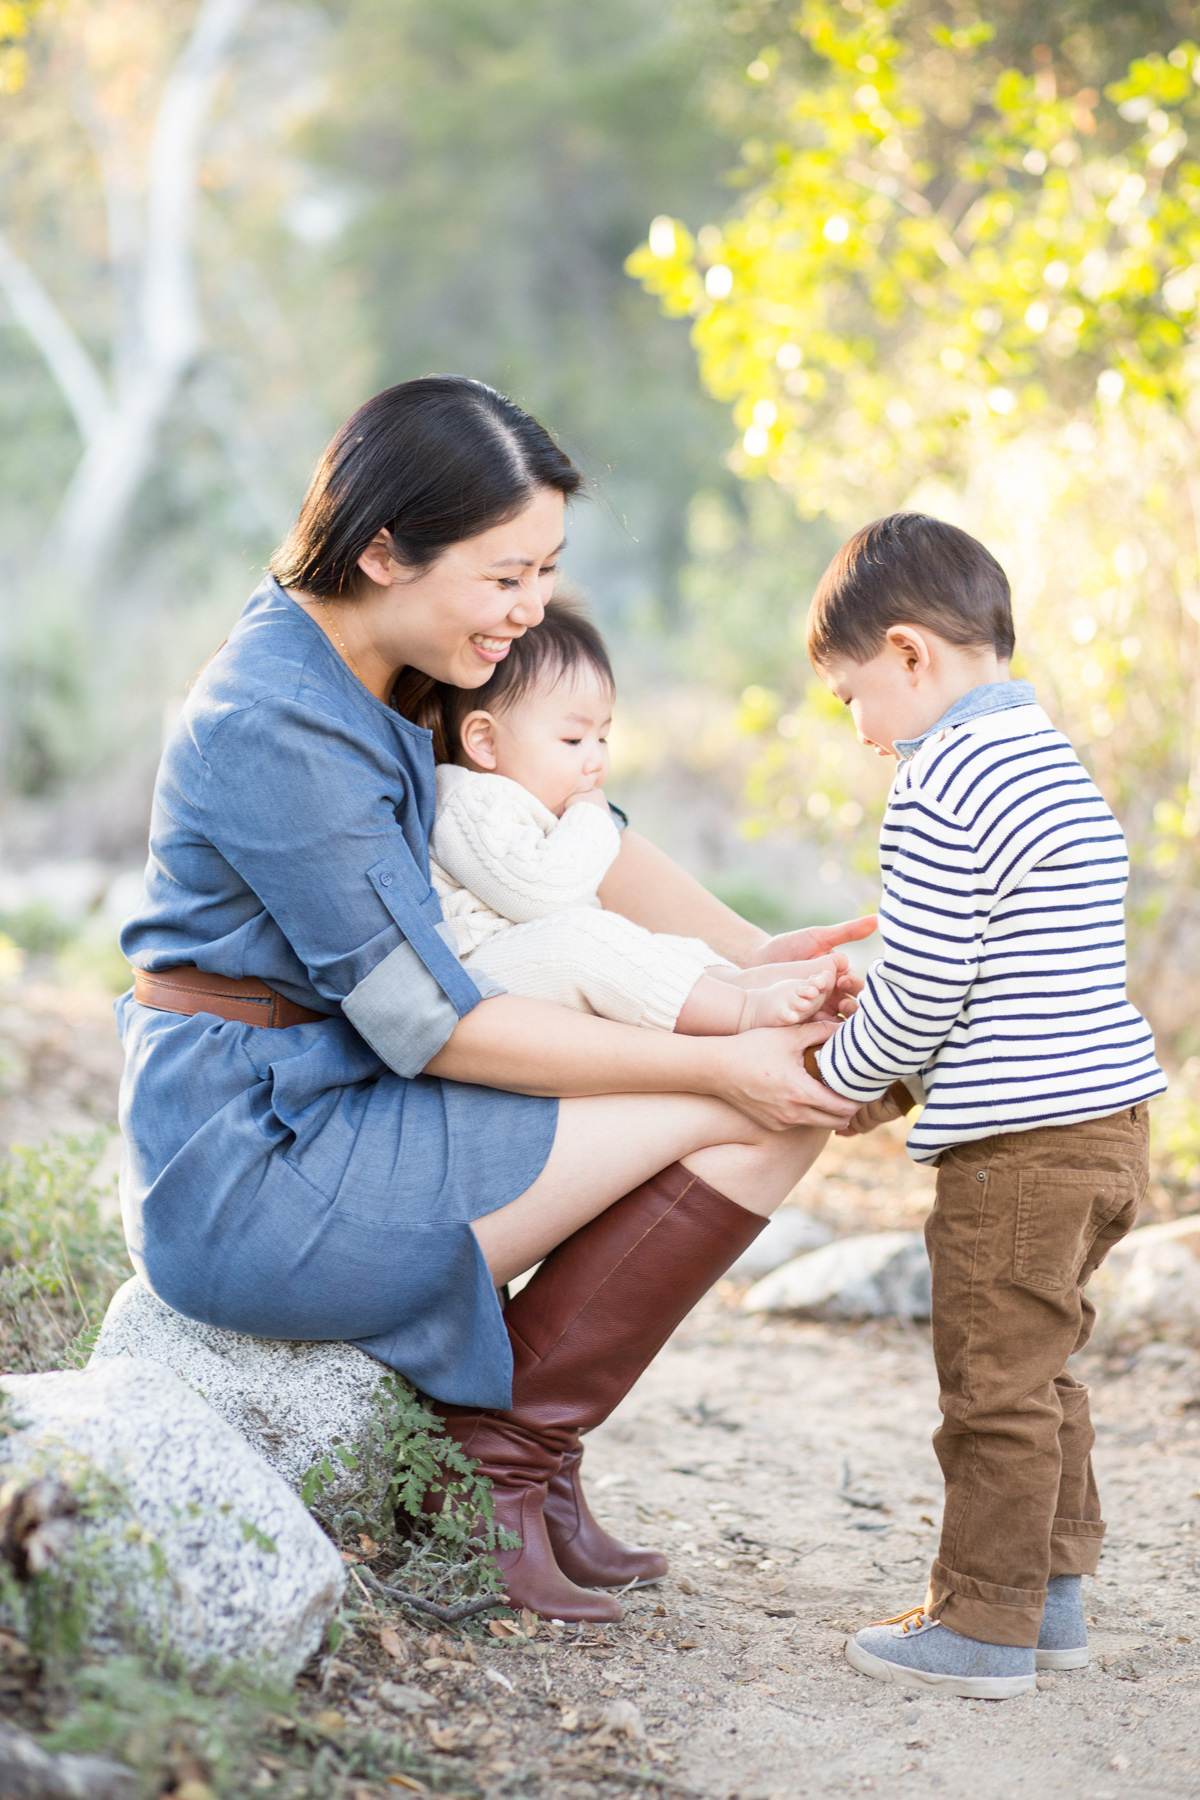 pasadenafamilysession013